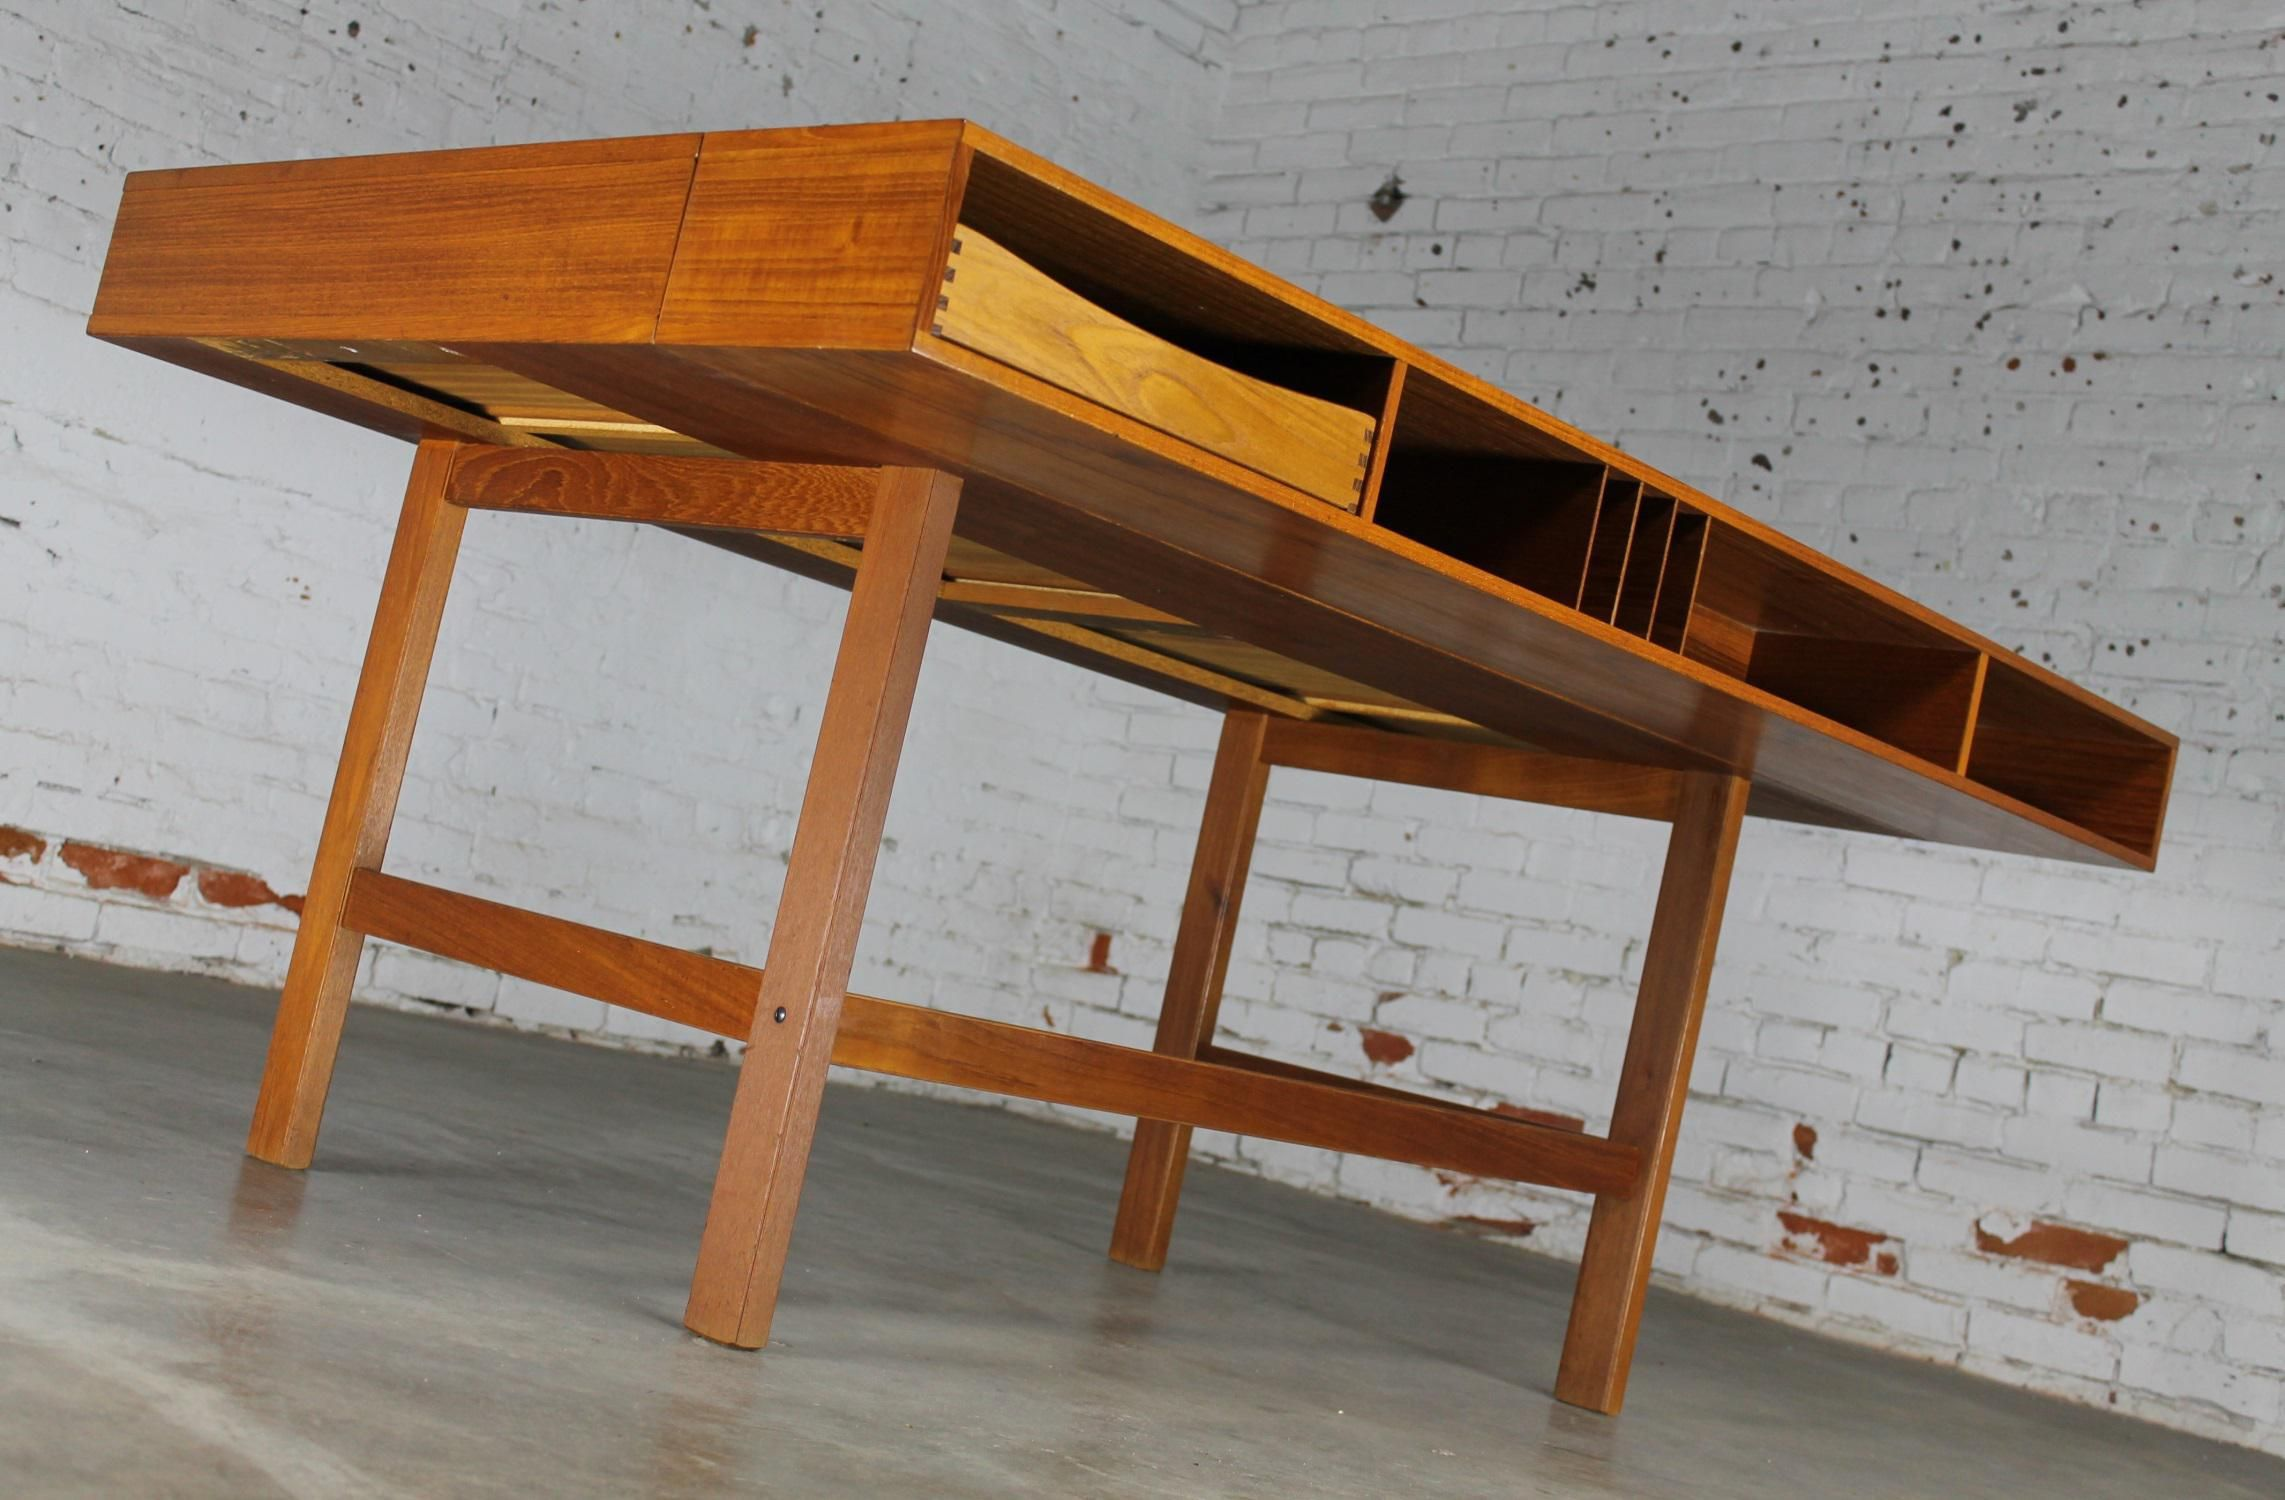 Incredible Mid Century Danish Modern Teak Flip Top Partner S Desk Attributed To Peter Lovig Nielsen And Produced By Heden Mid Century Danish Partners Desk Teak